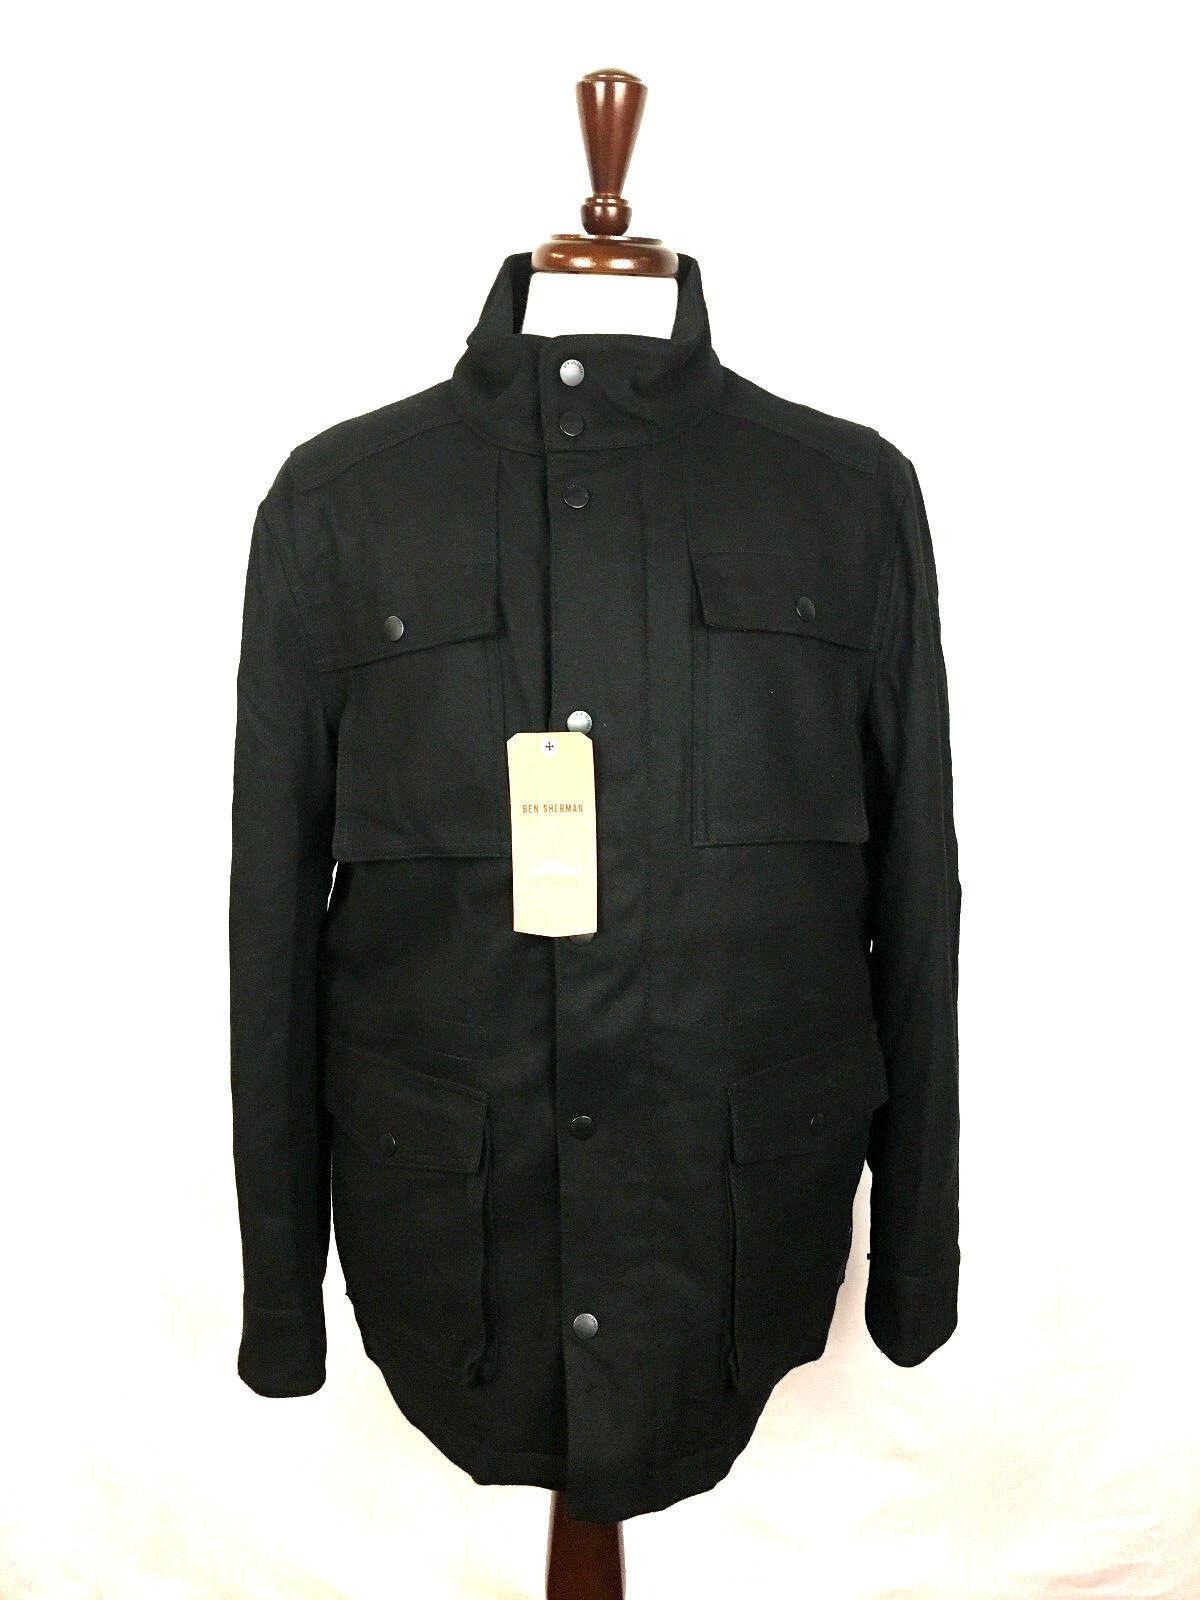 Ben Sherman Black Lined Wool Military Pea Coat Winter Jacket | eBay